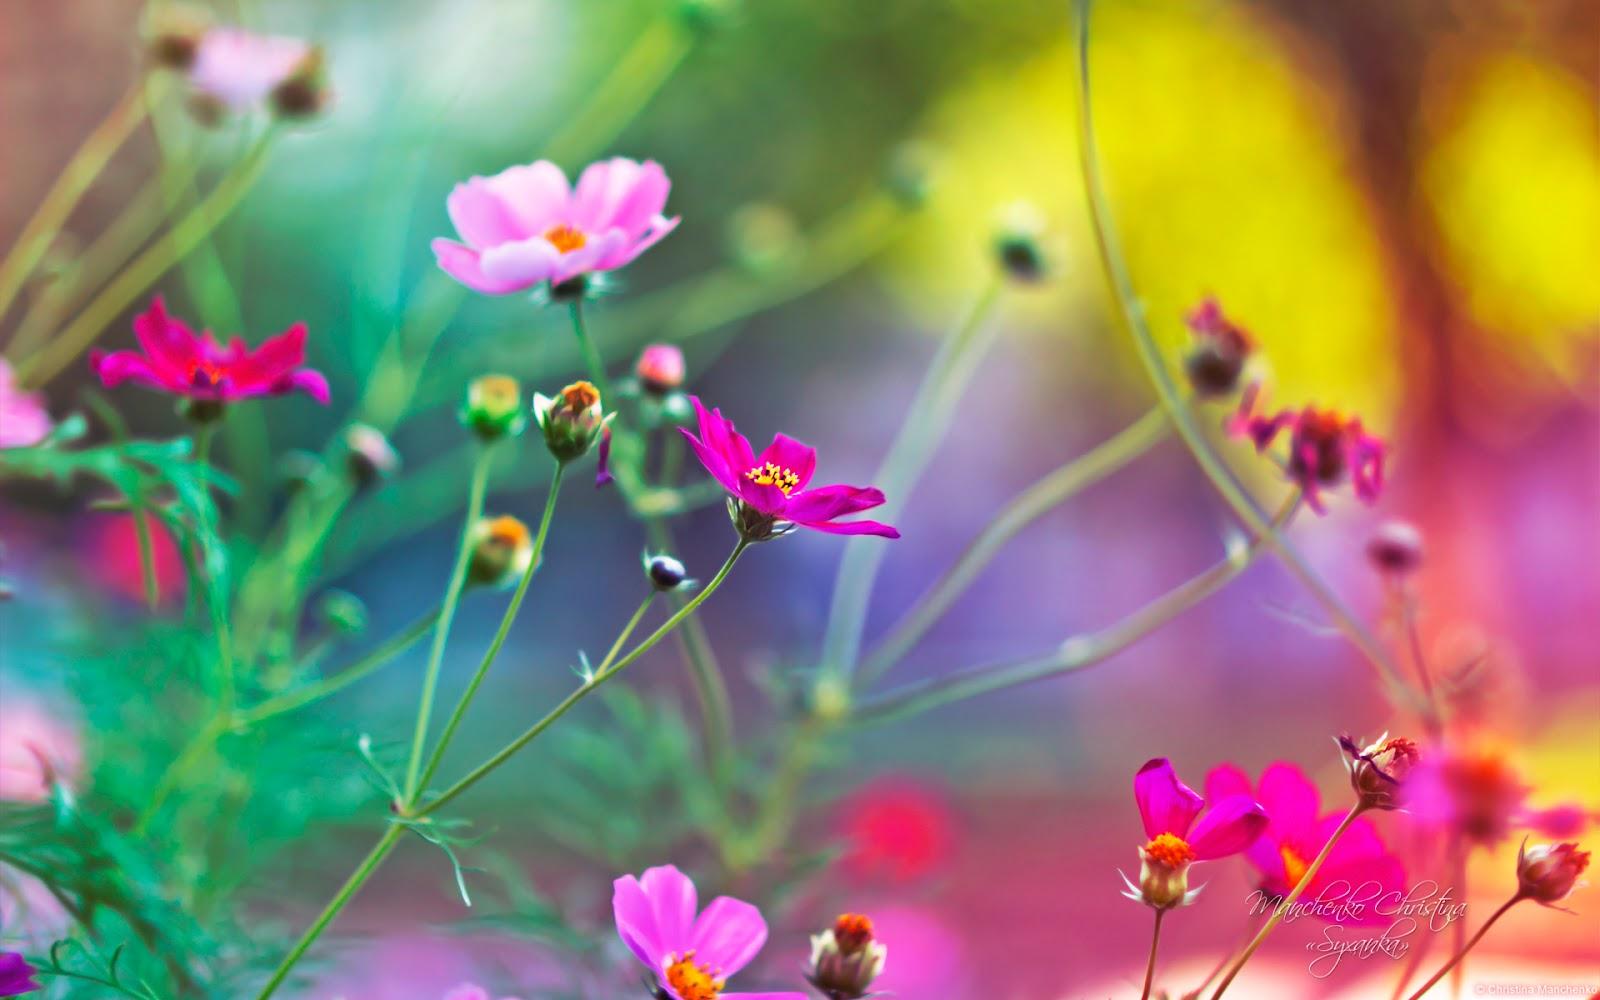 Amazing World: Beautiful nature and flowers wallpaper ...